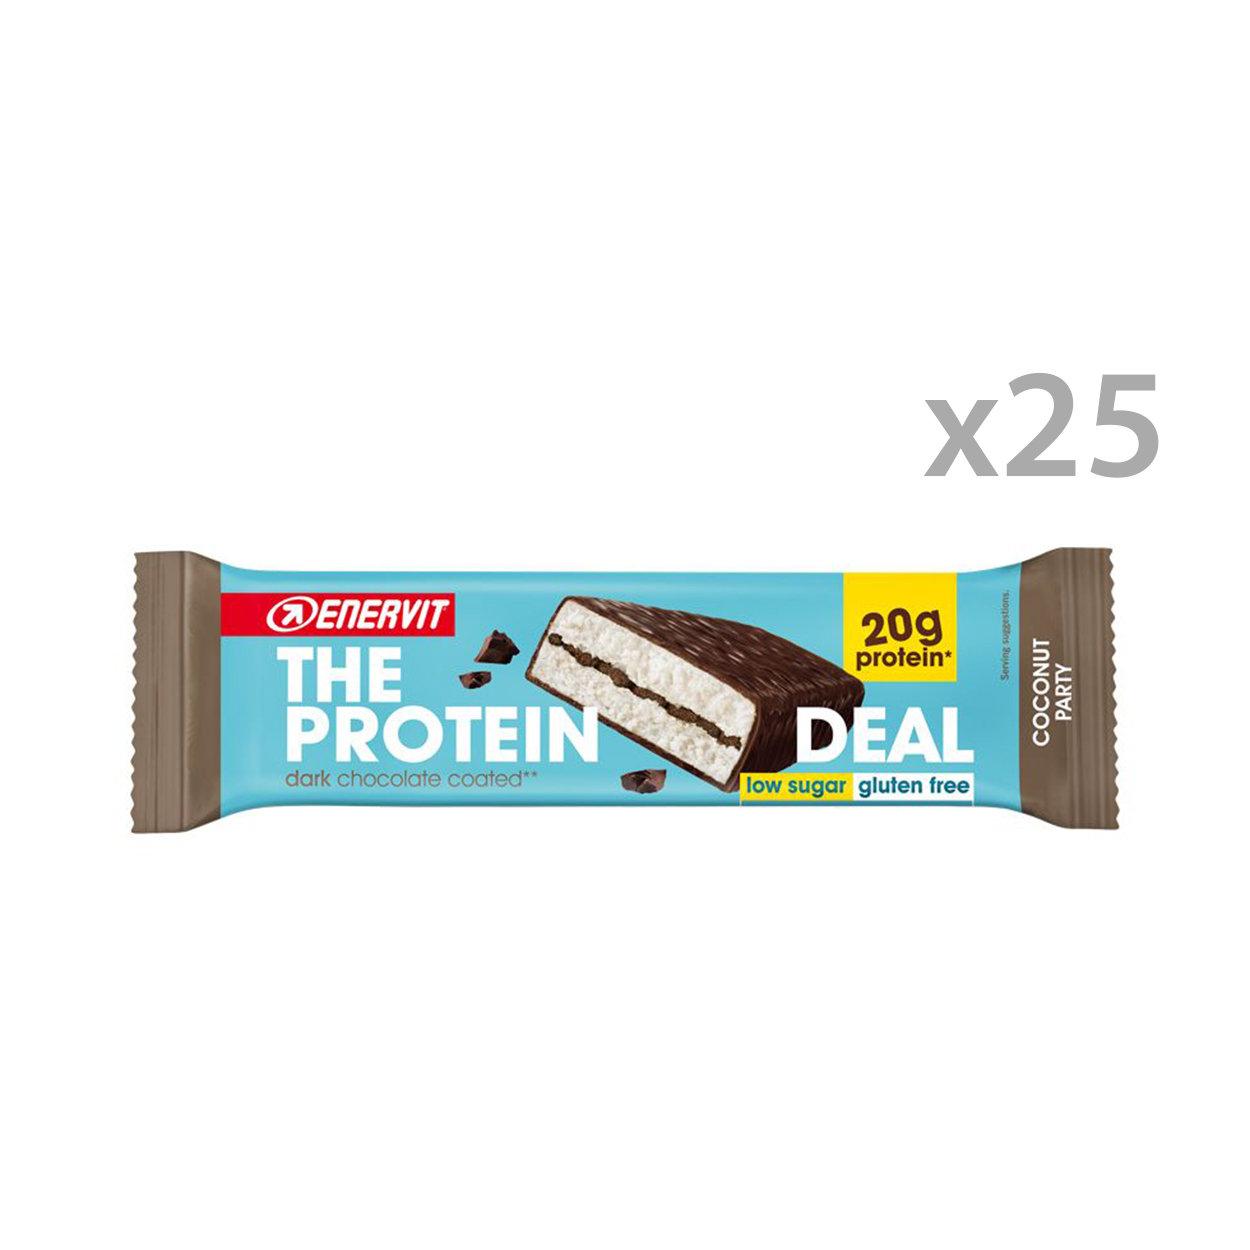 25 barrette da 55 gr - Enervit The Protein Deal Bar Cocco